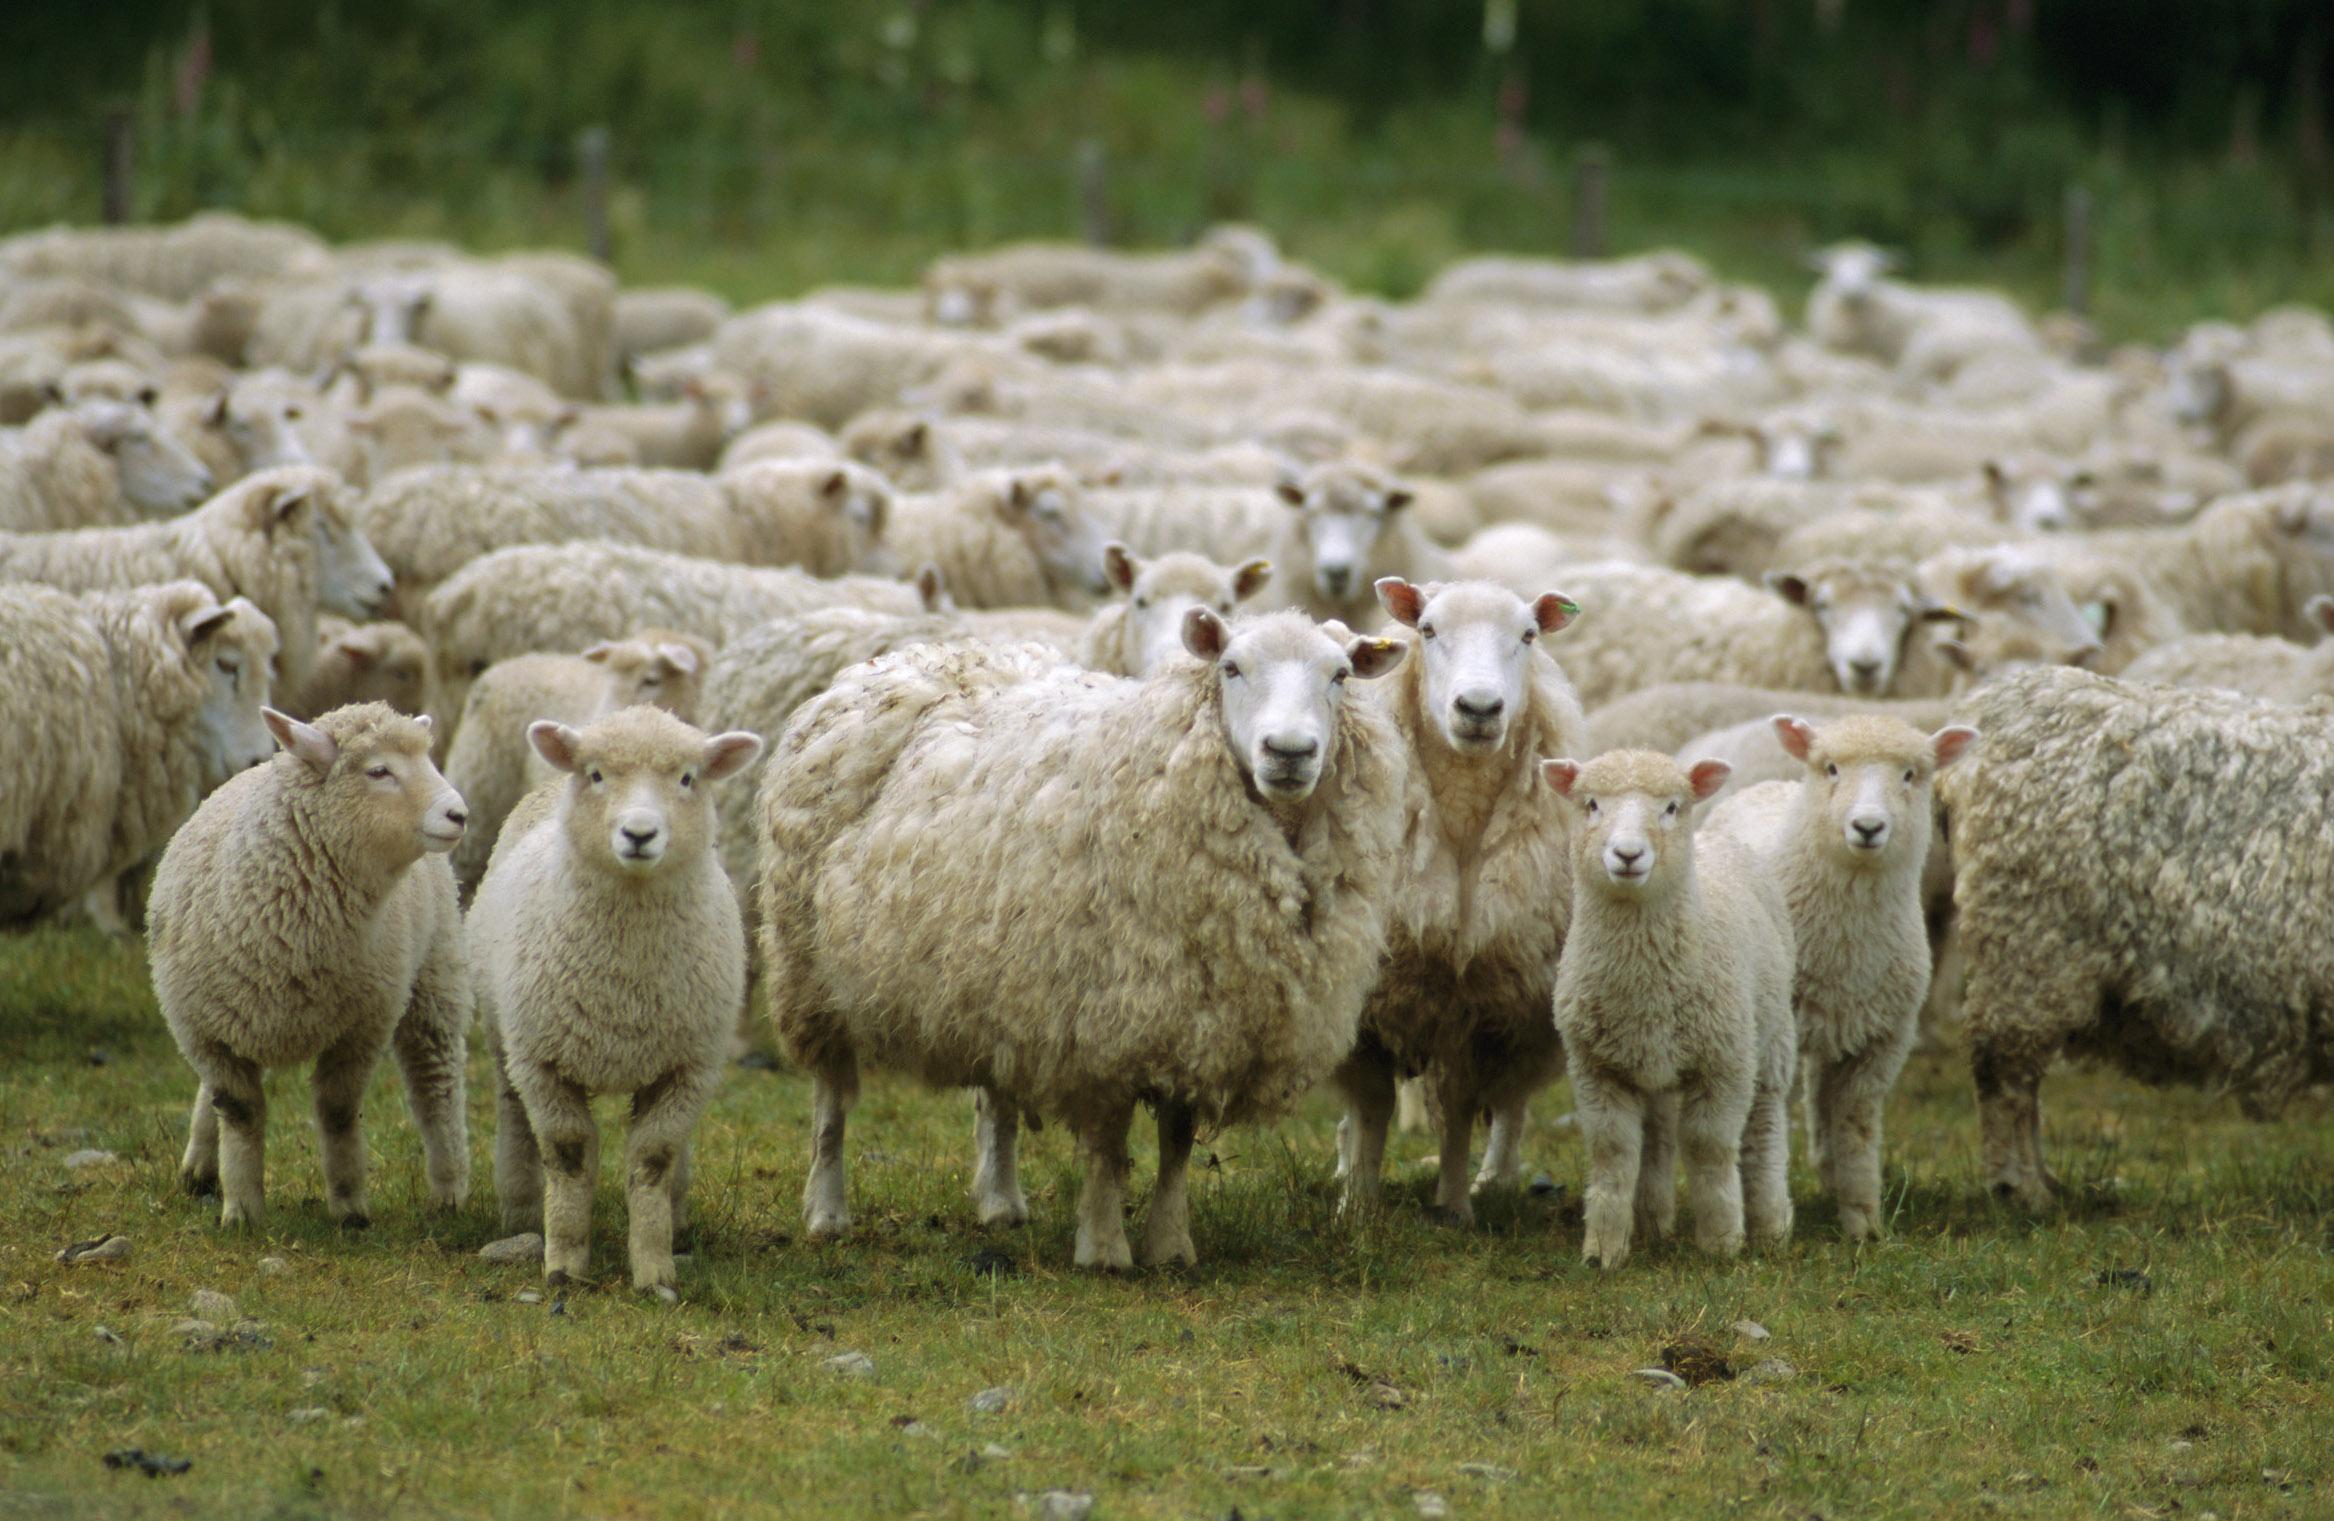 Flock of sheep